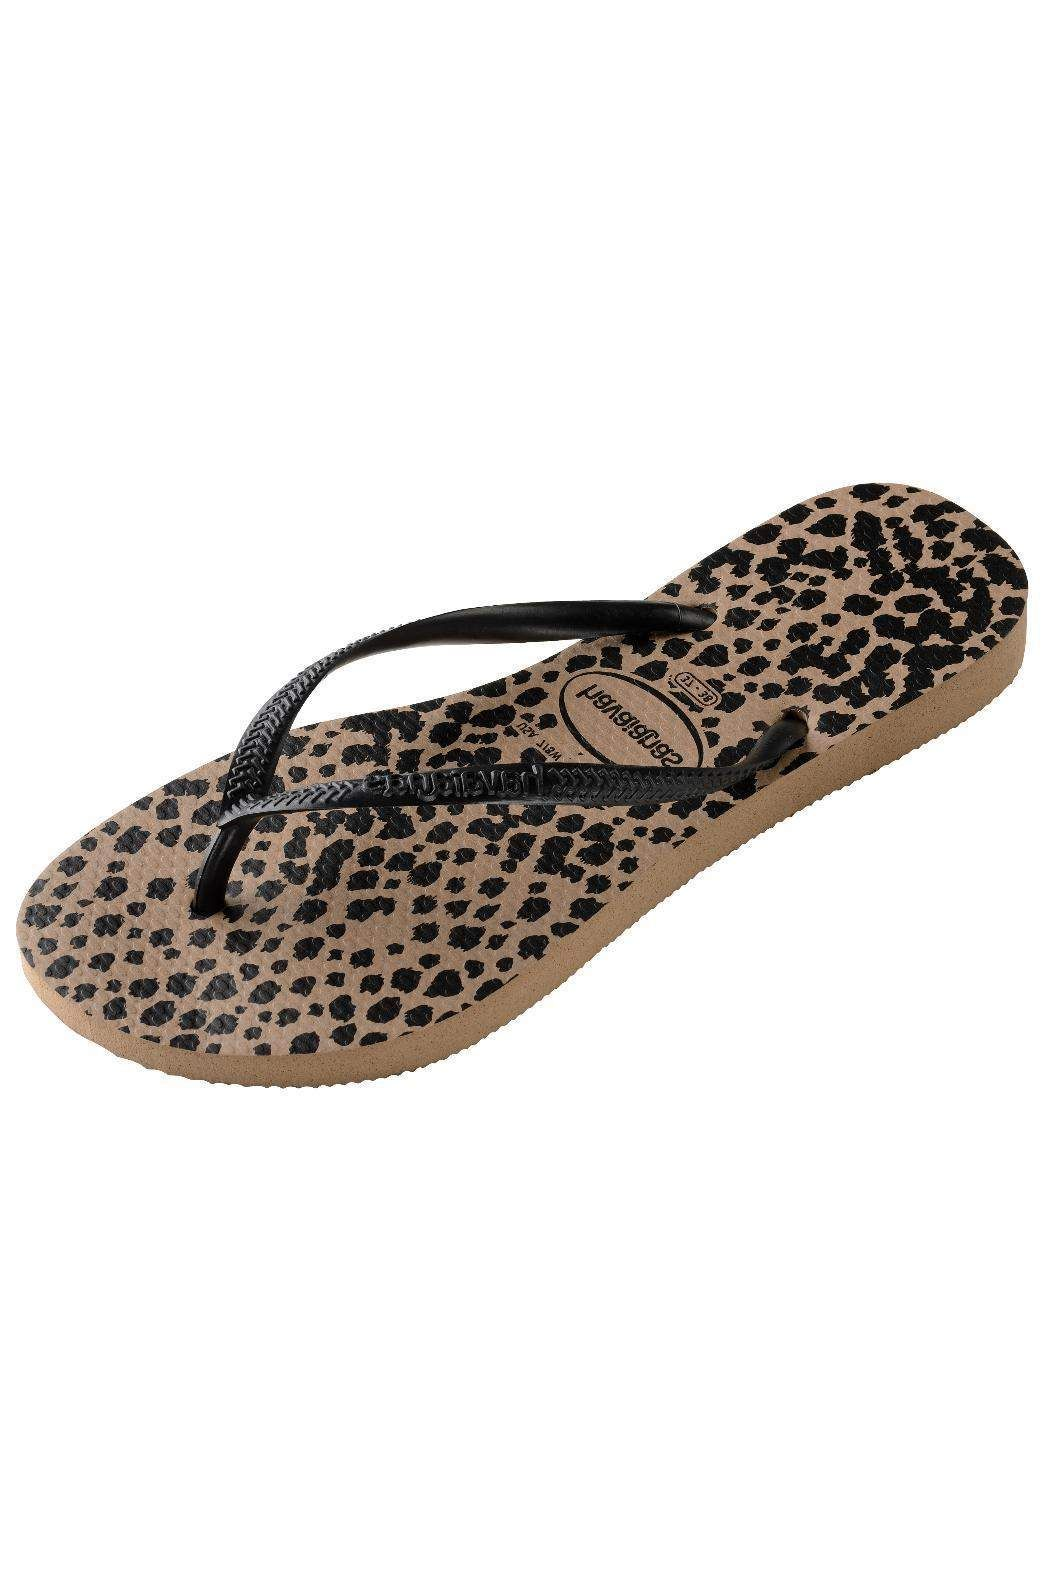 f5d659e07fafeb Rose gold black flip flops. Runs narrow. The original flip flop from  Brazil. Durable rubber sole. Slim rubber straps. Size Guide  35 36  US 6